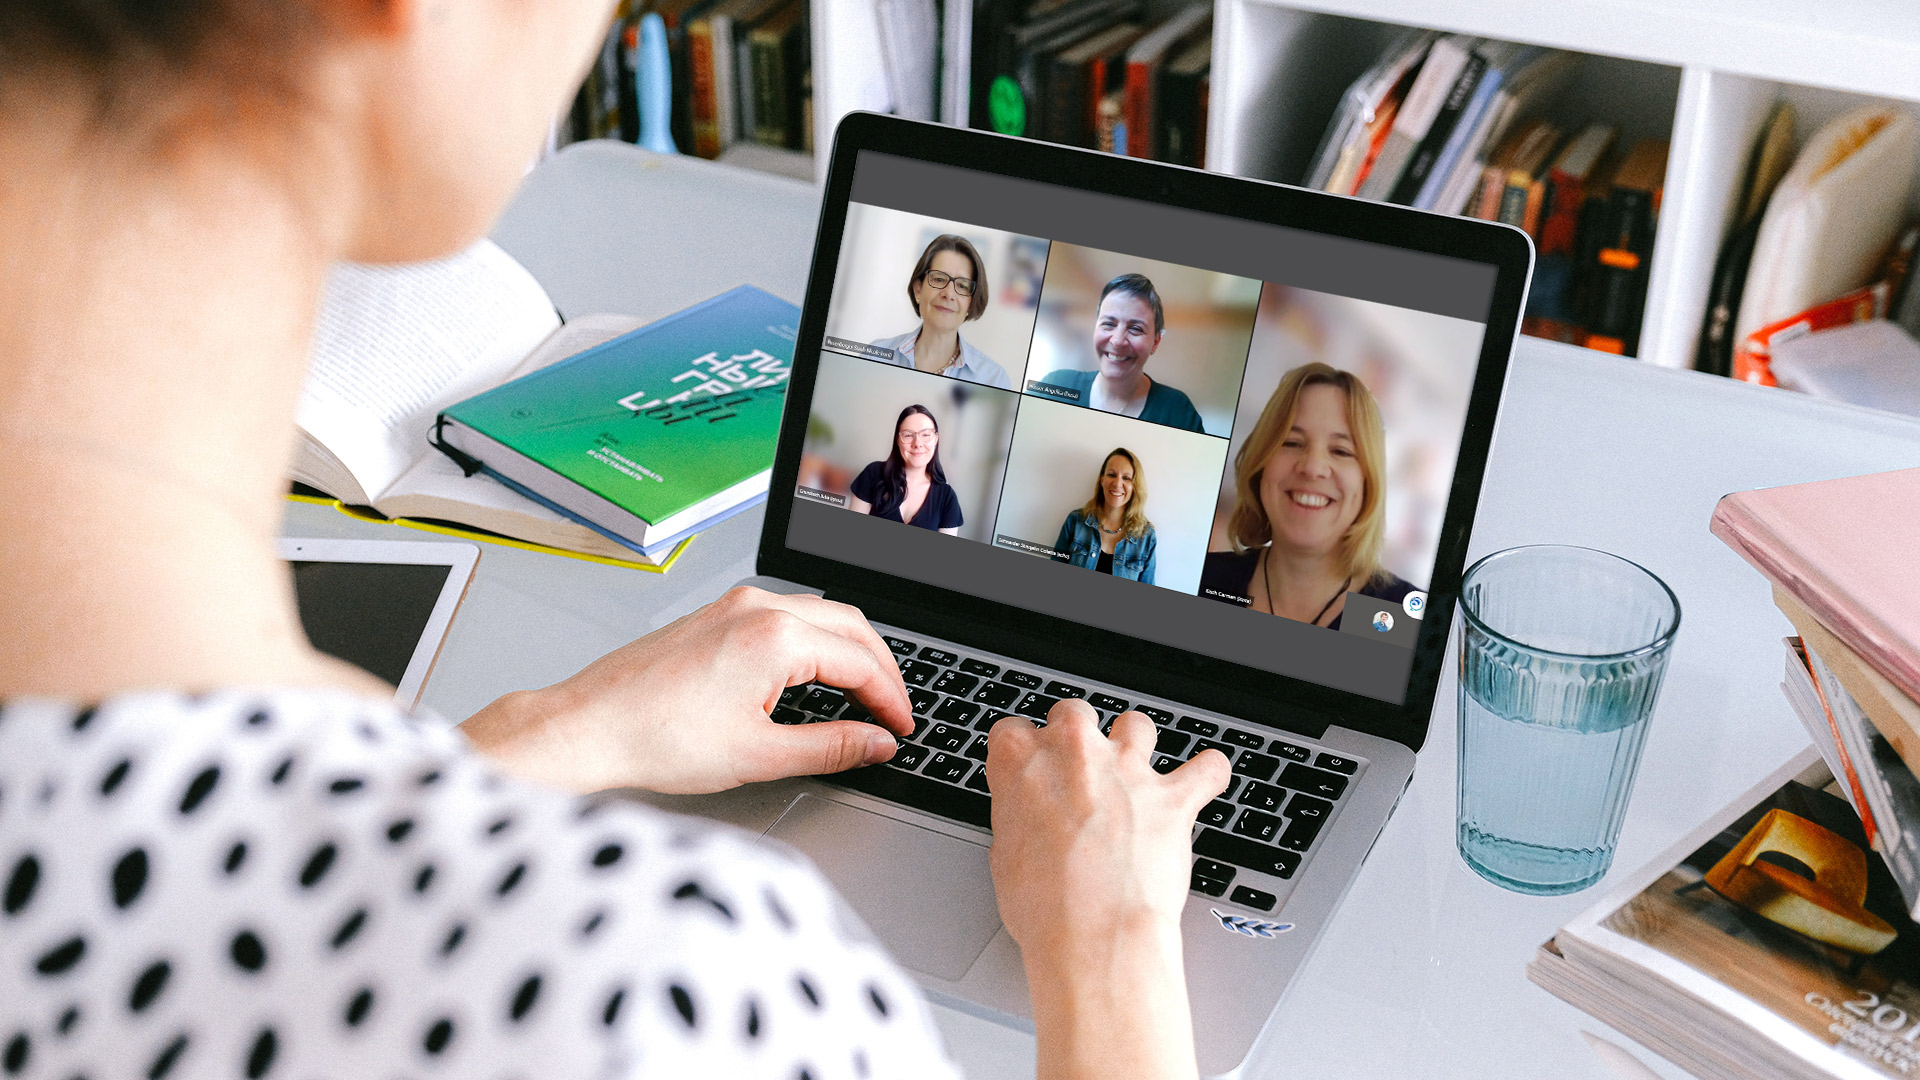 Schulkommunikation im digitalen Wandel ZHAW IAM